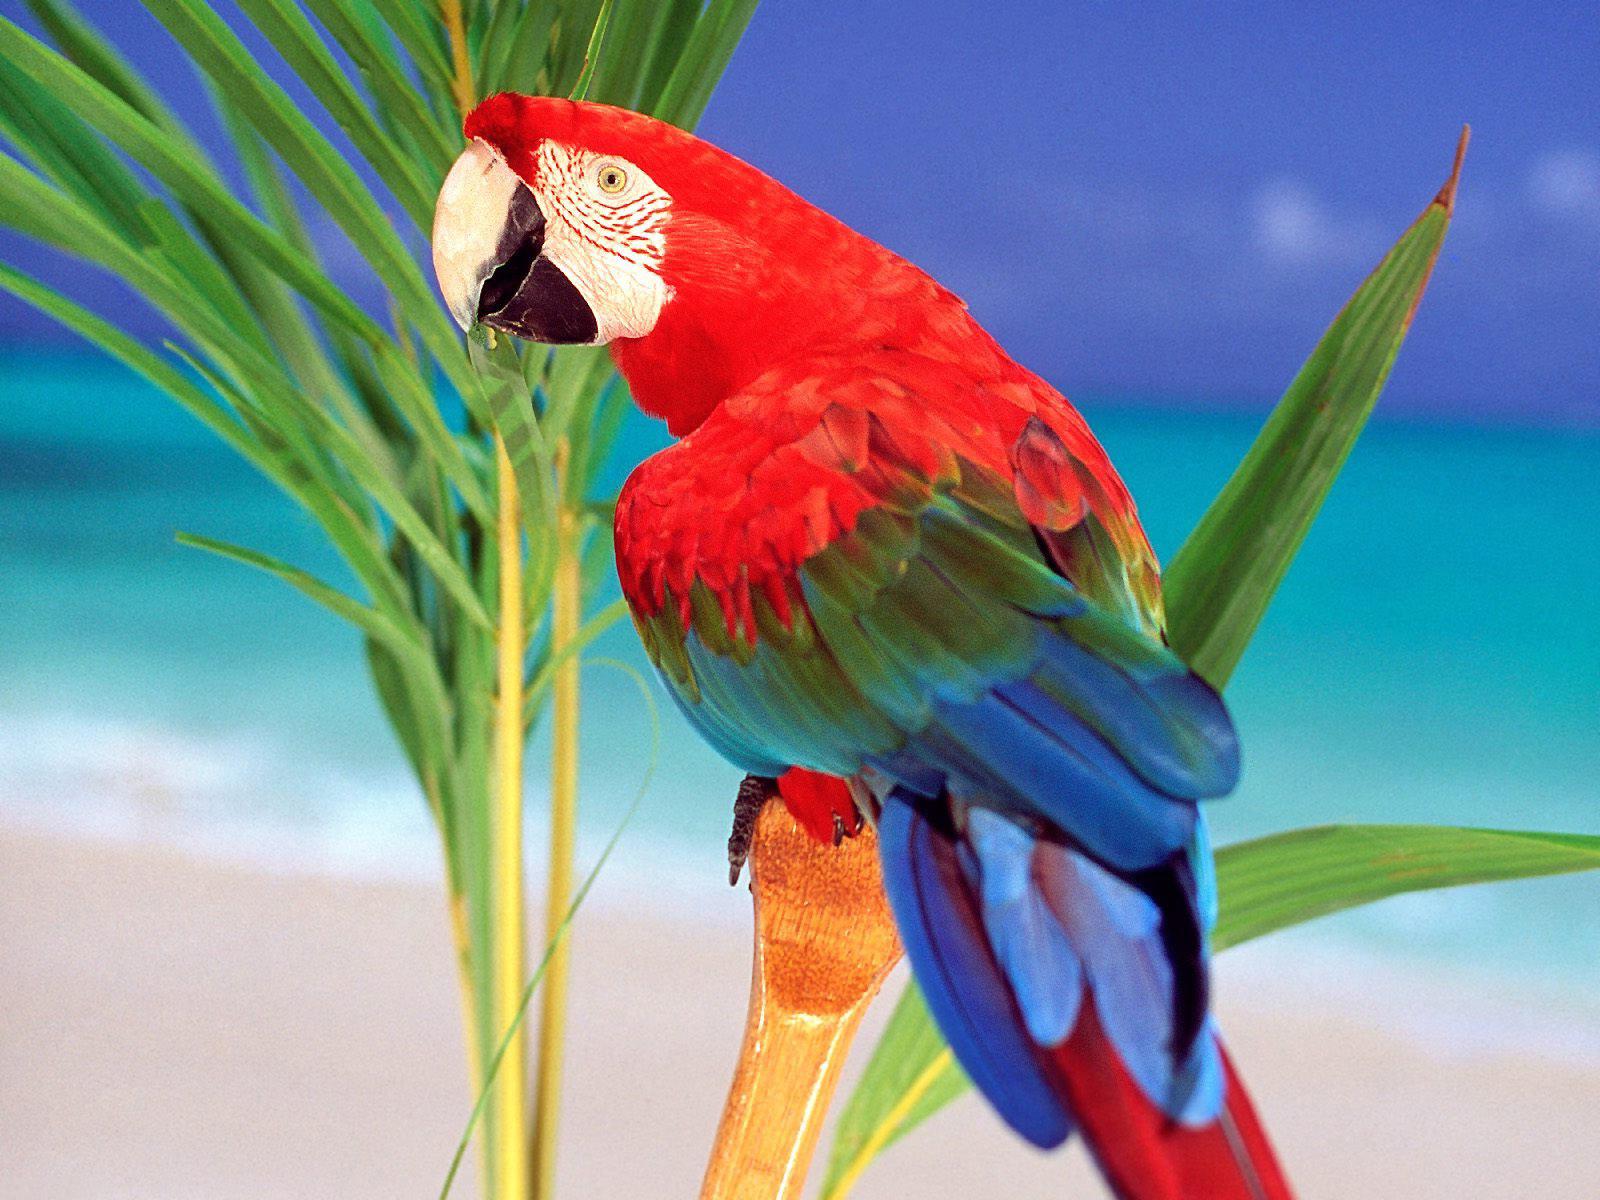 parrots birds pictures wallpaper desktop parrots birds wallpaper 1600x1200